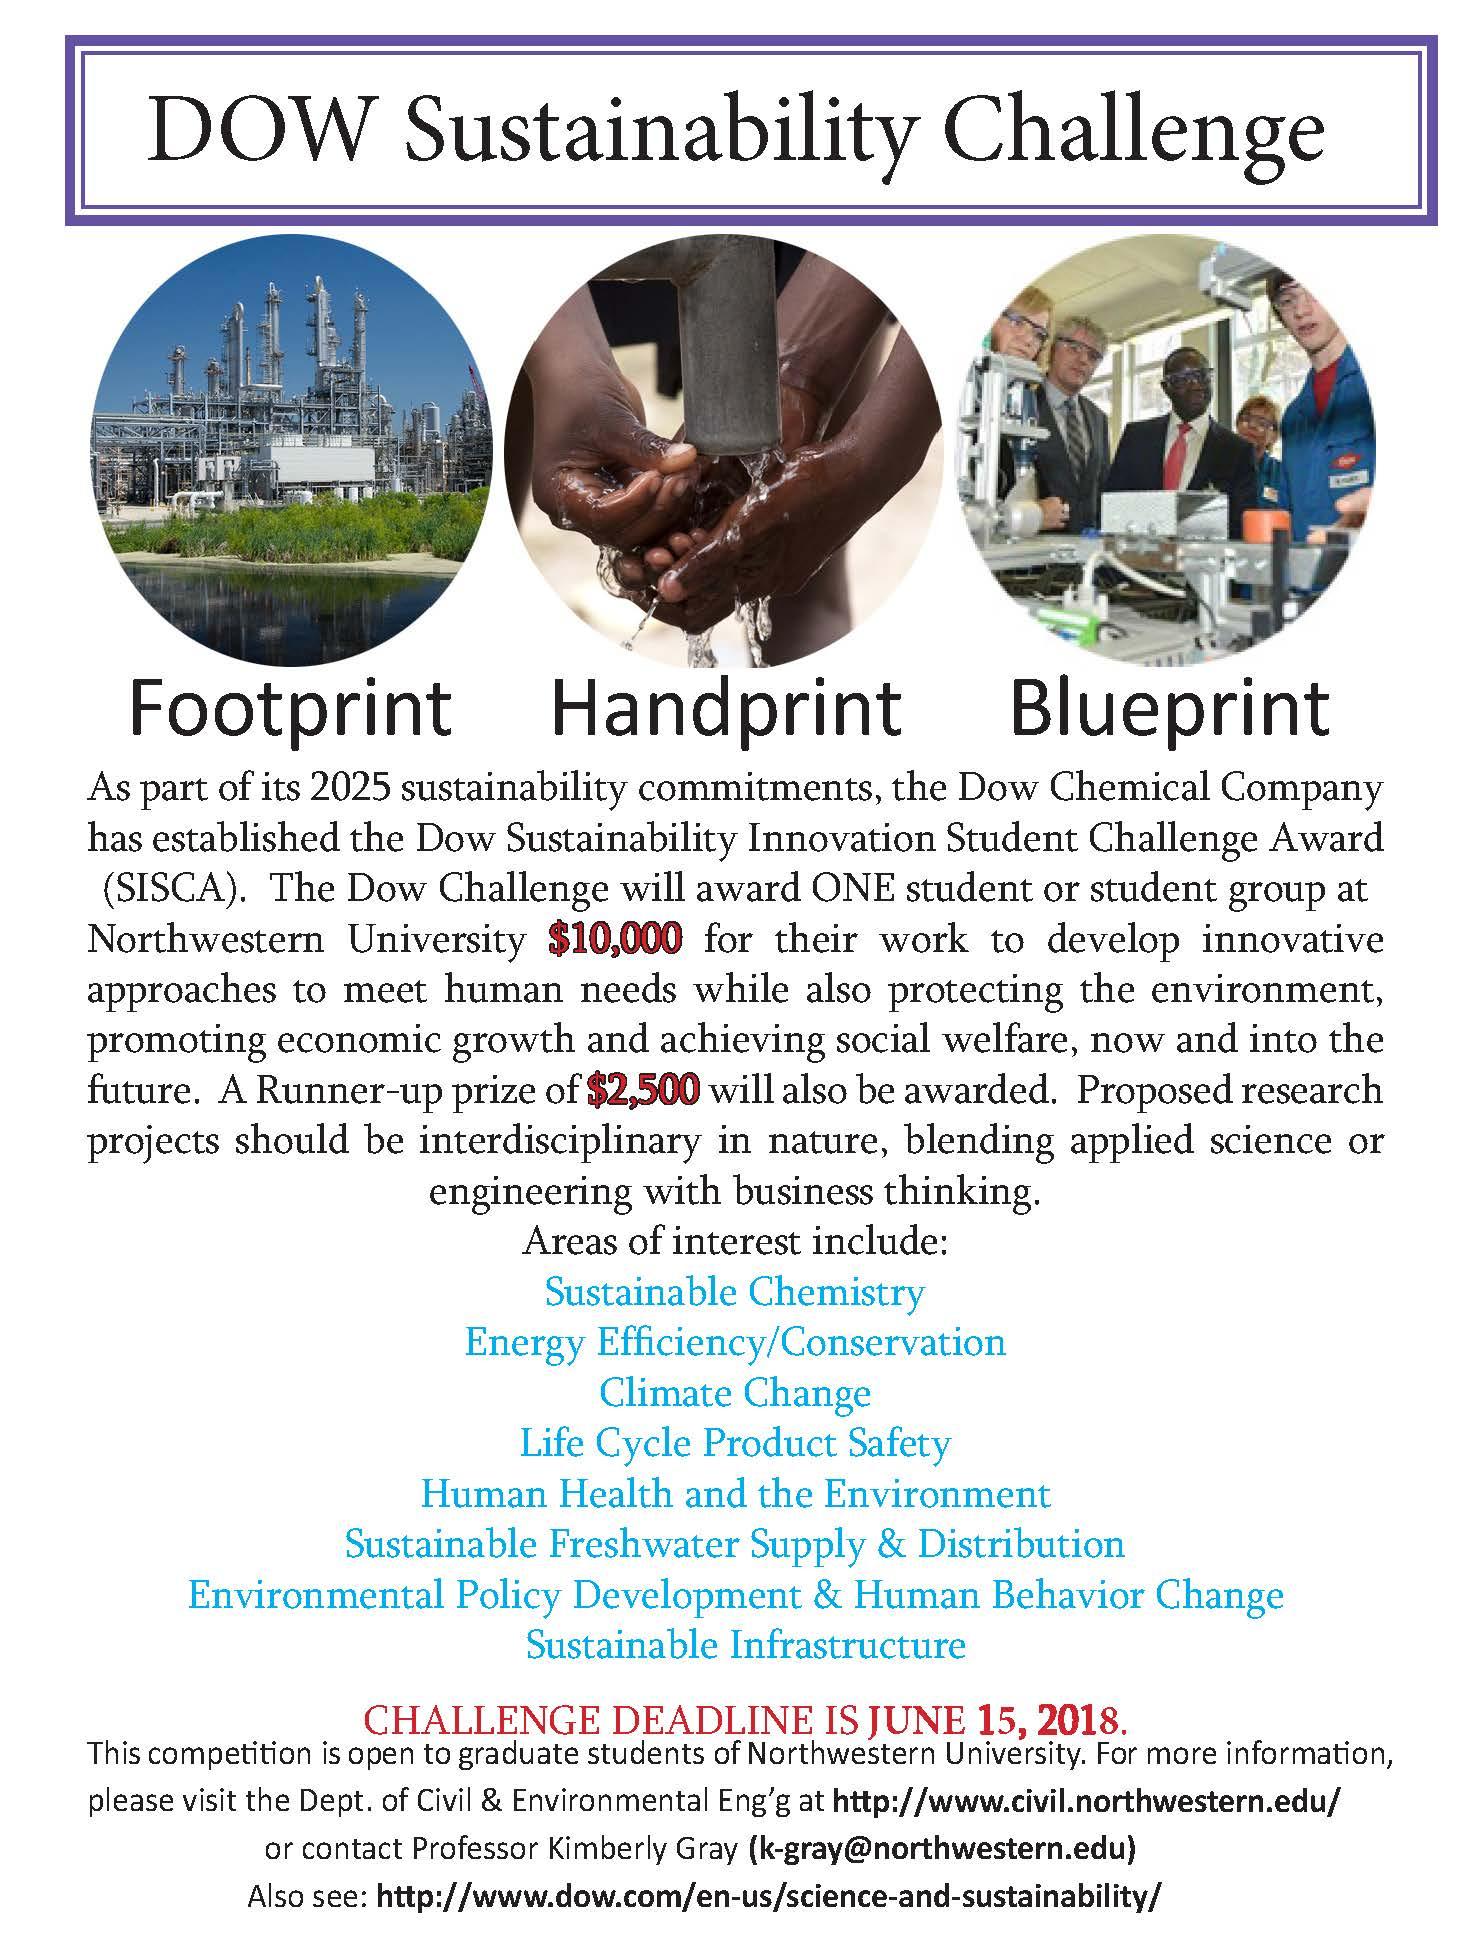 DOW 2018 Sustainability Challenge  News  Civil  Environmental Engineering  Northwestern